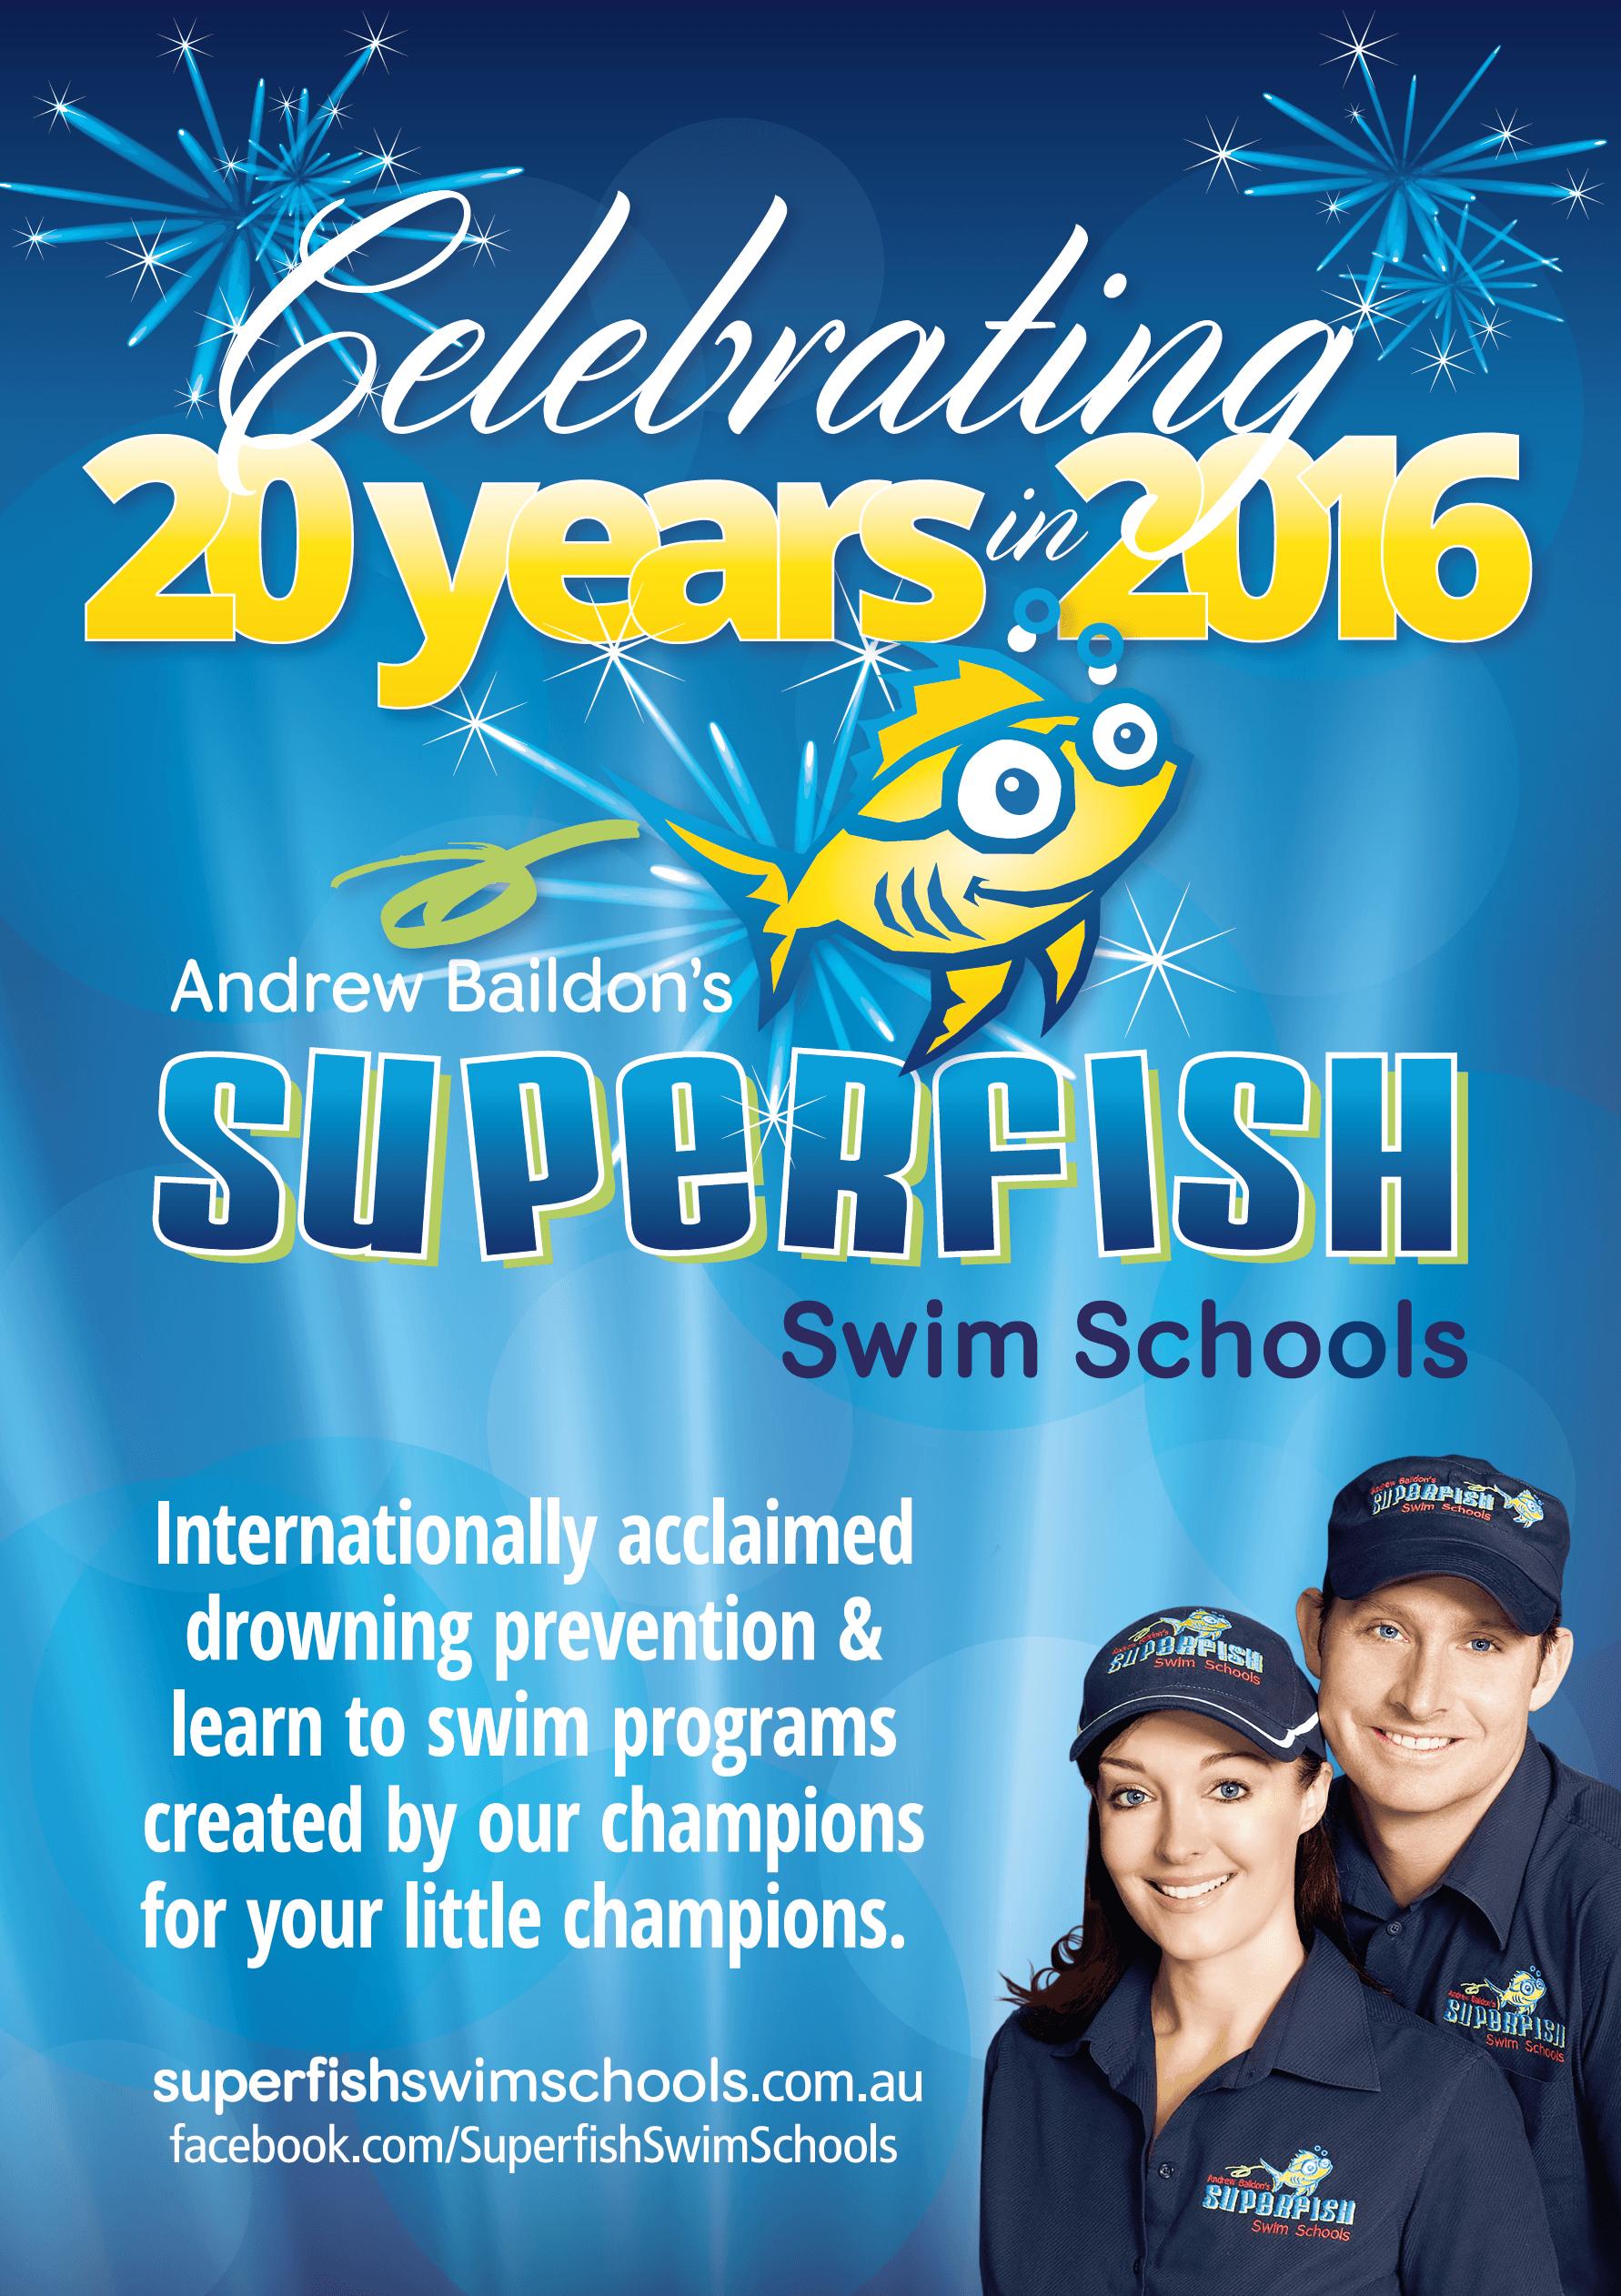 Superfish Celebrating 20 Years in Learn to Swim!